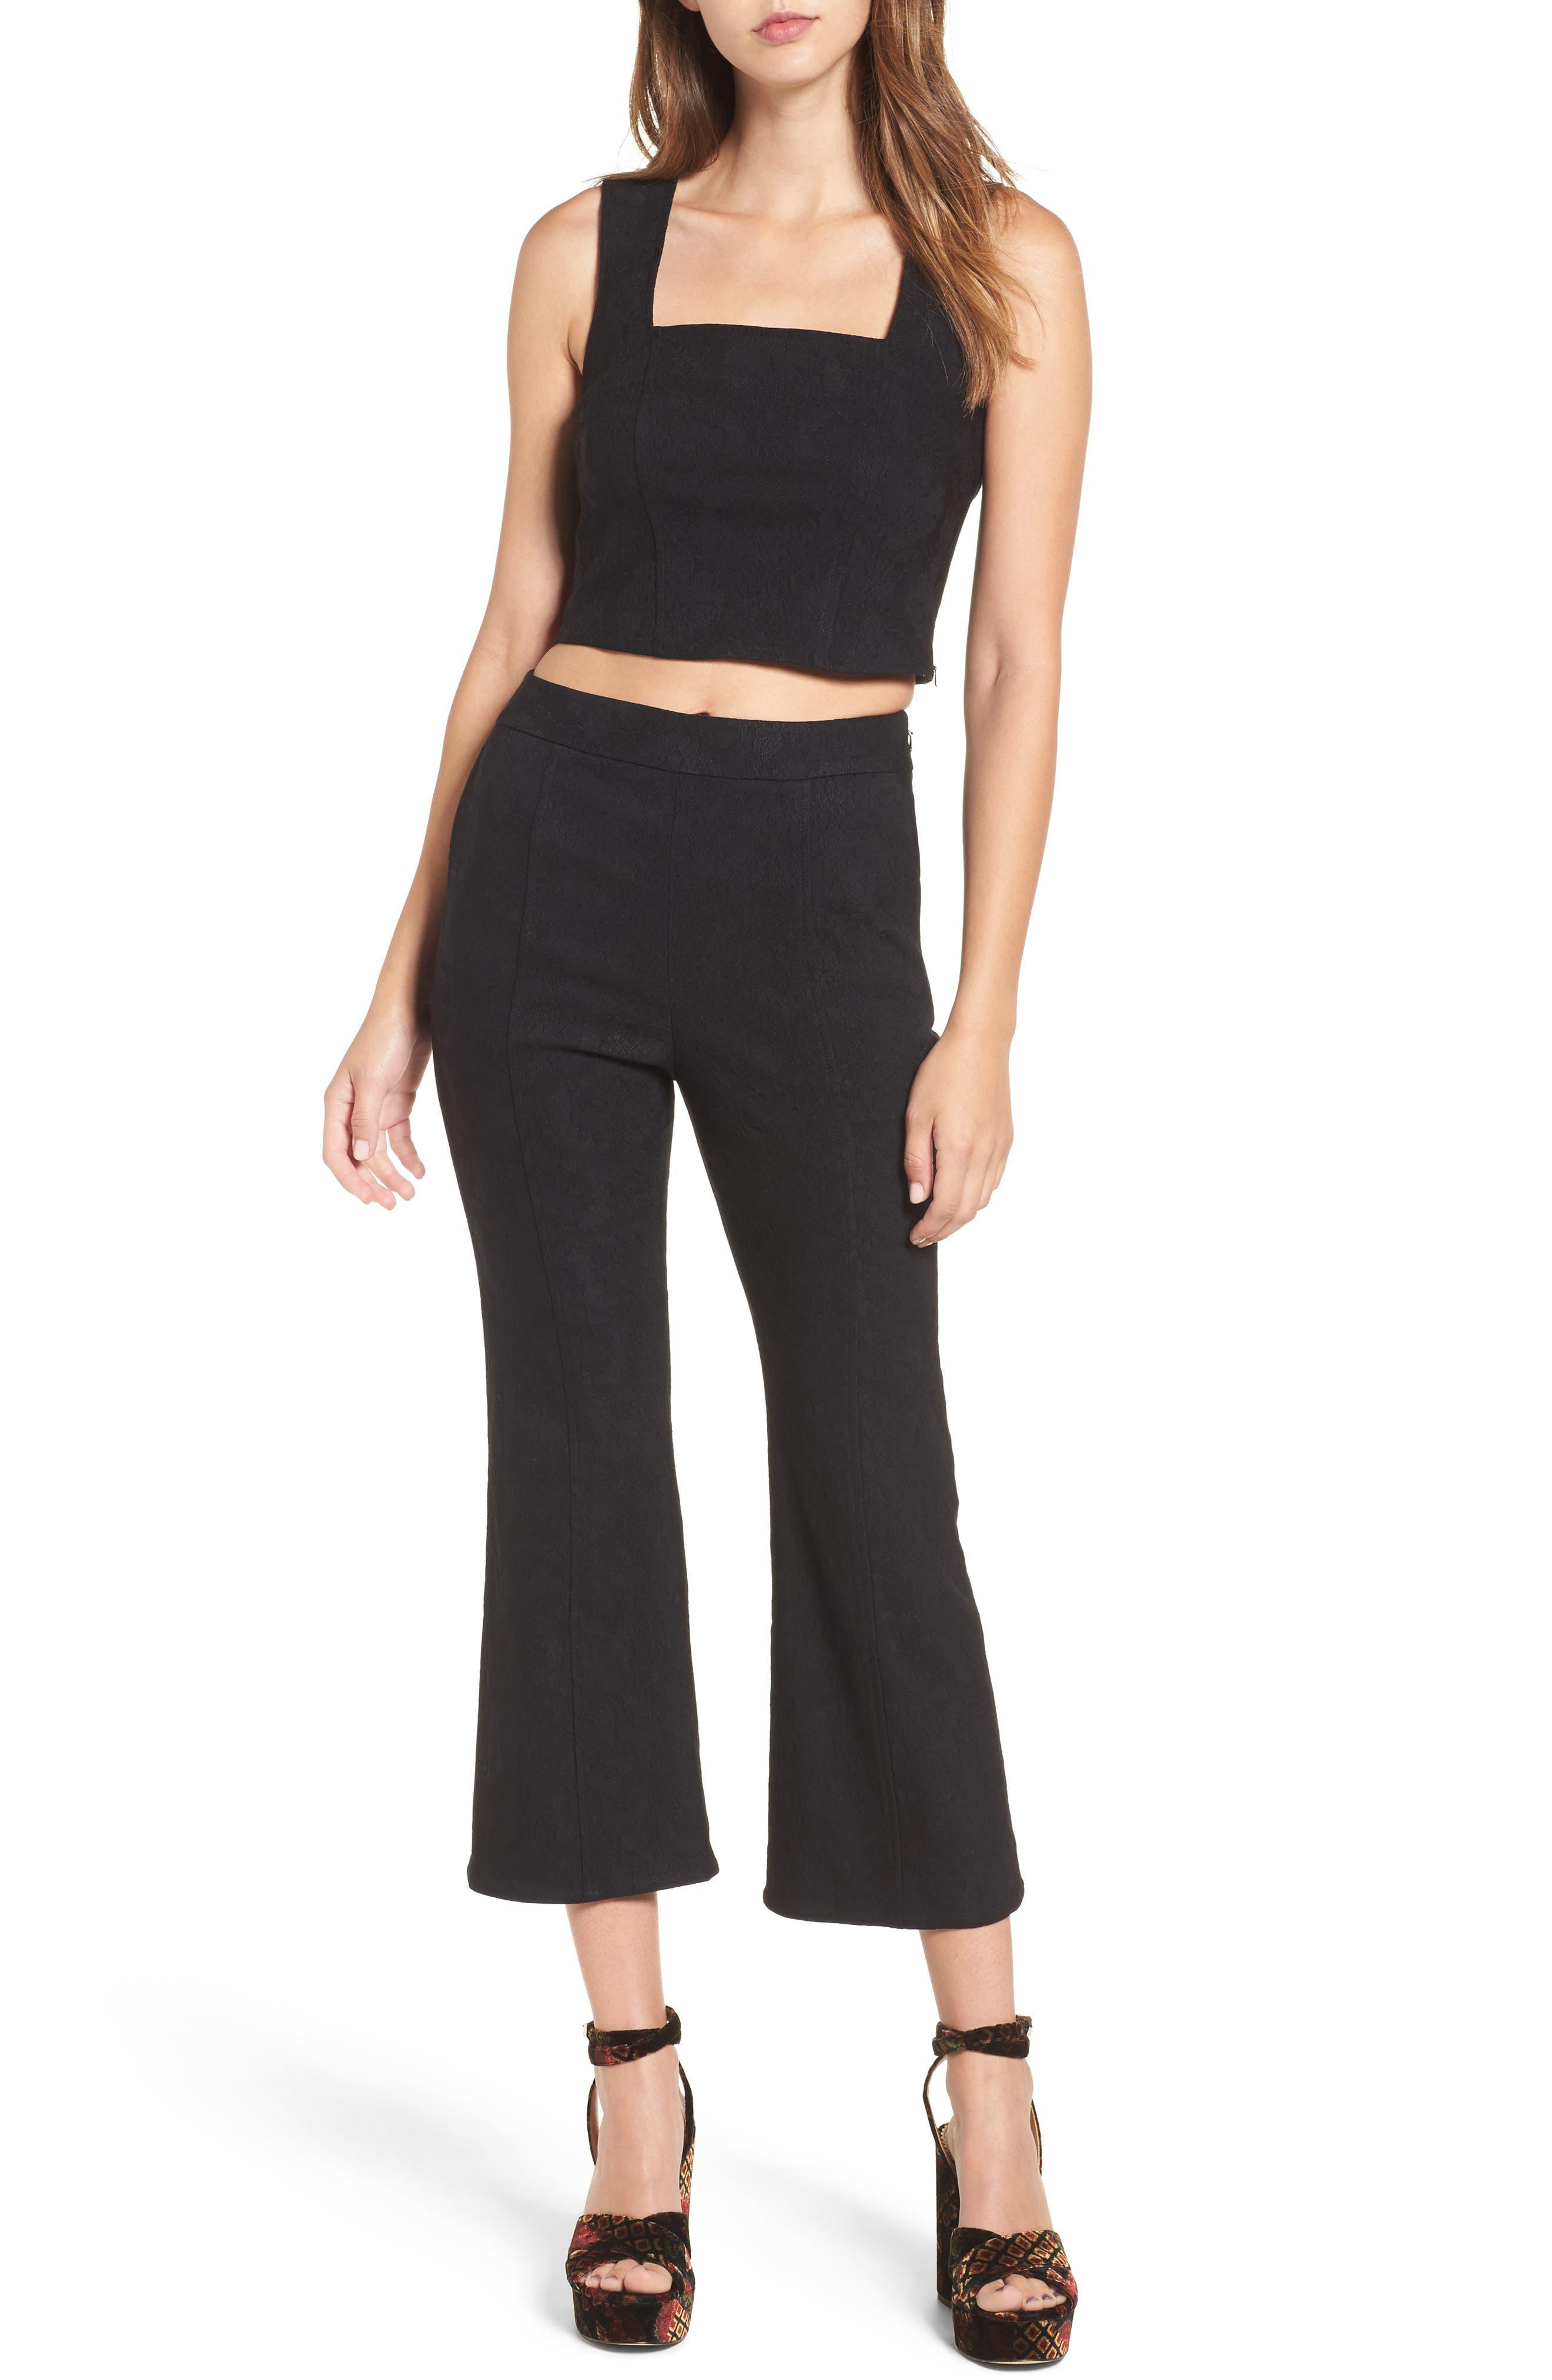 Leigh High Waist Crop Pants,                             Alternate thumbnail 2, color,                             Black